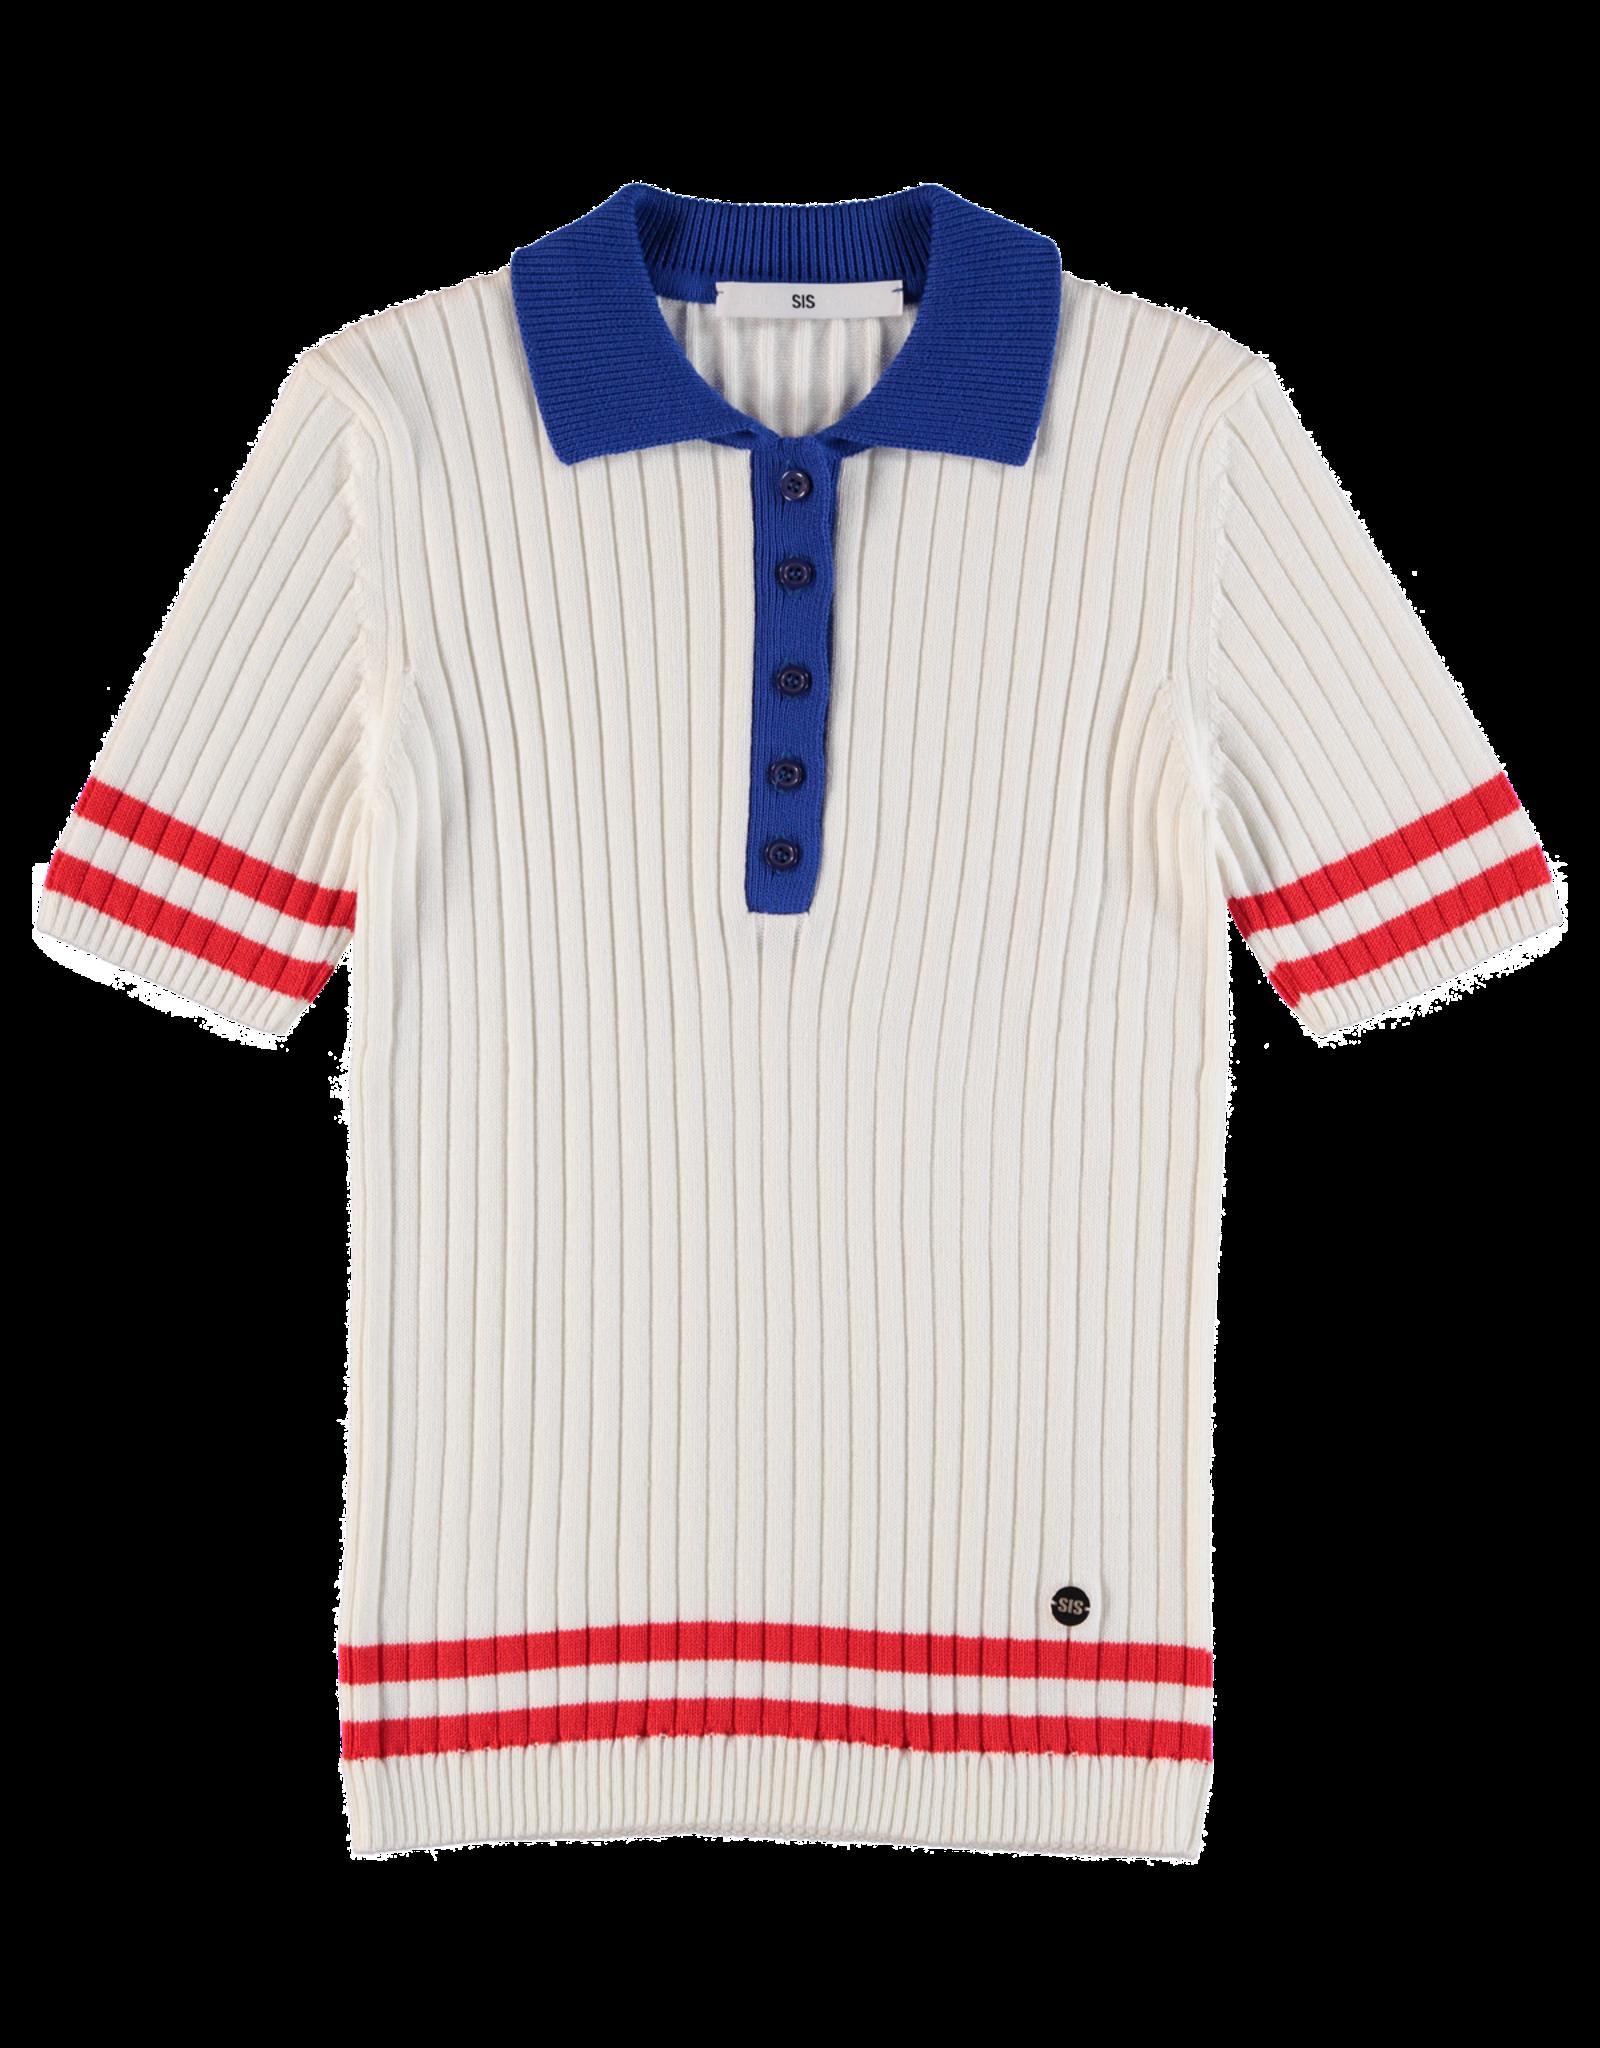 AW1819-120 Polo Knit Top